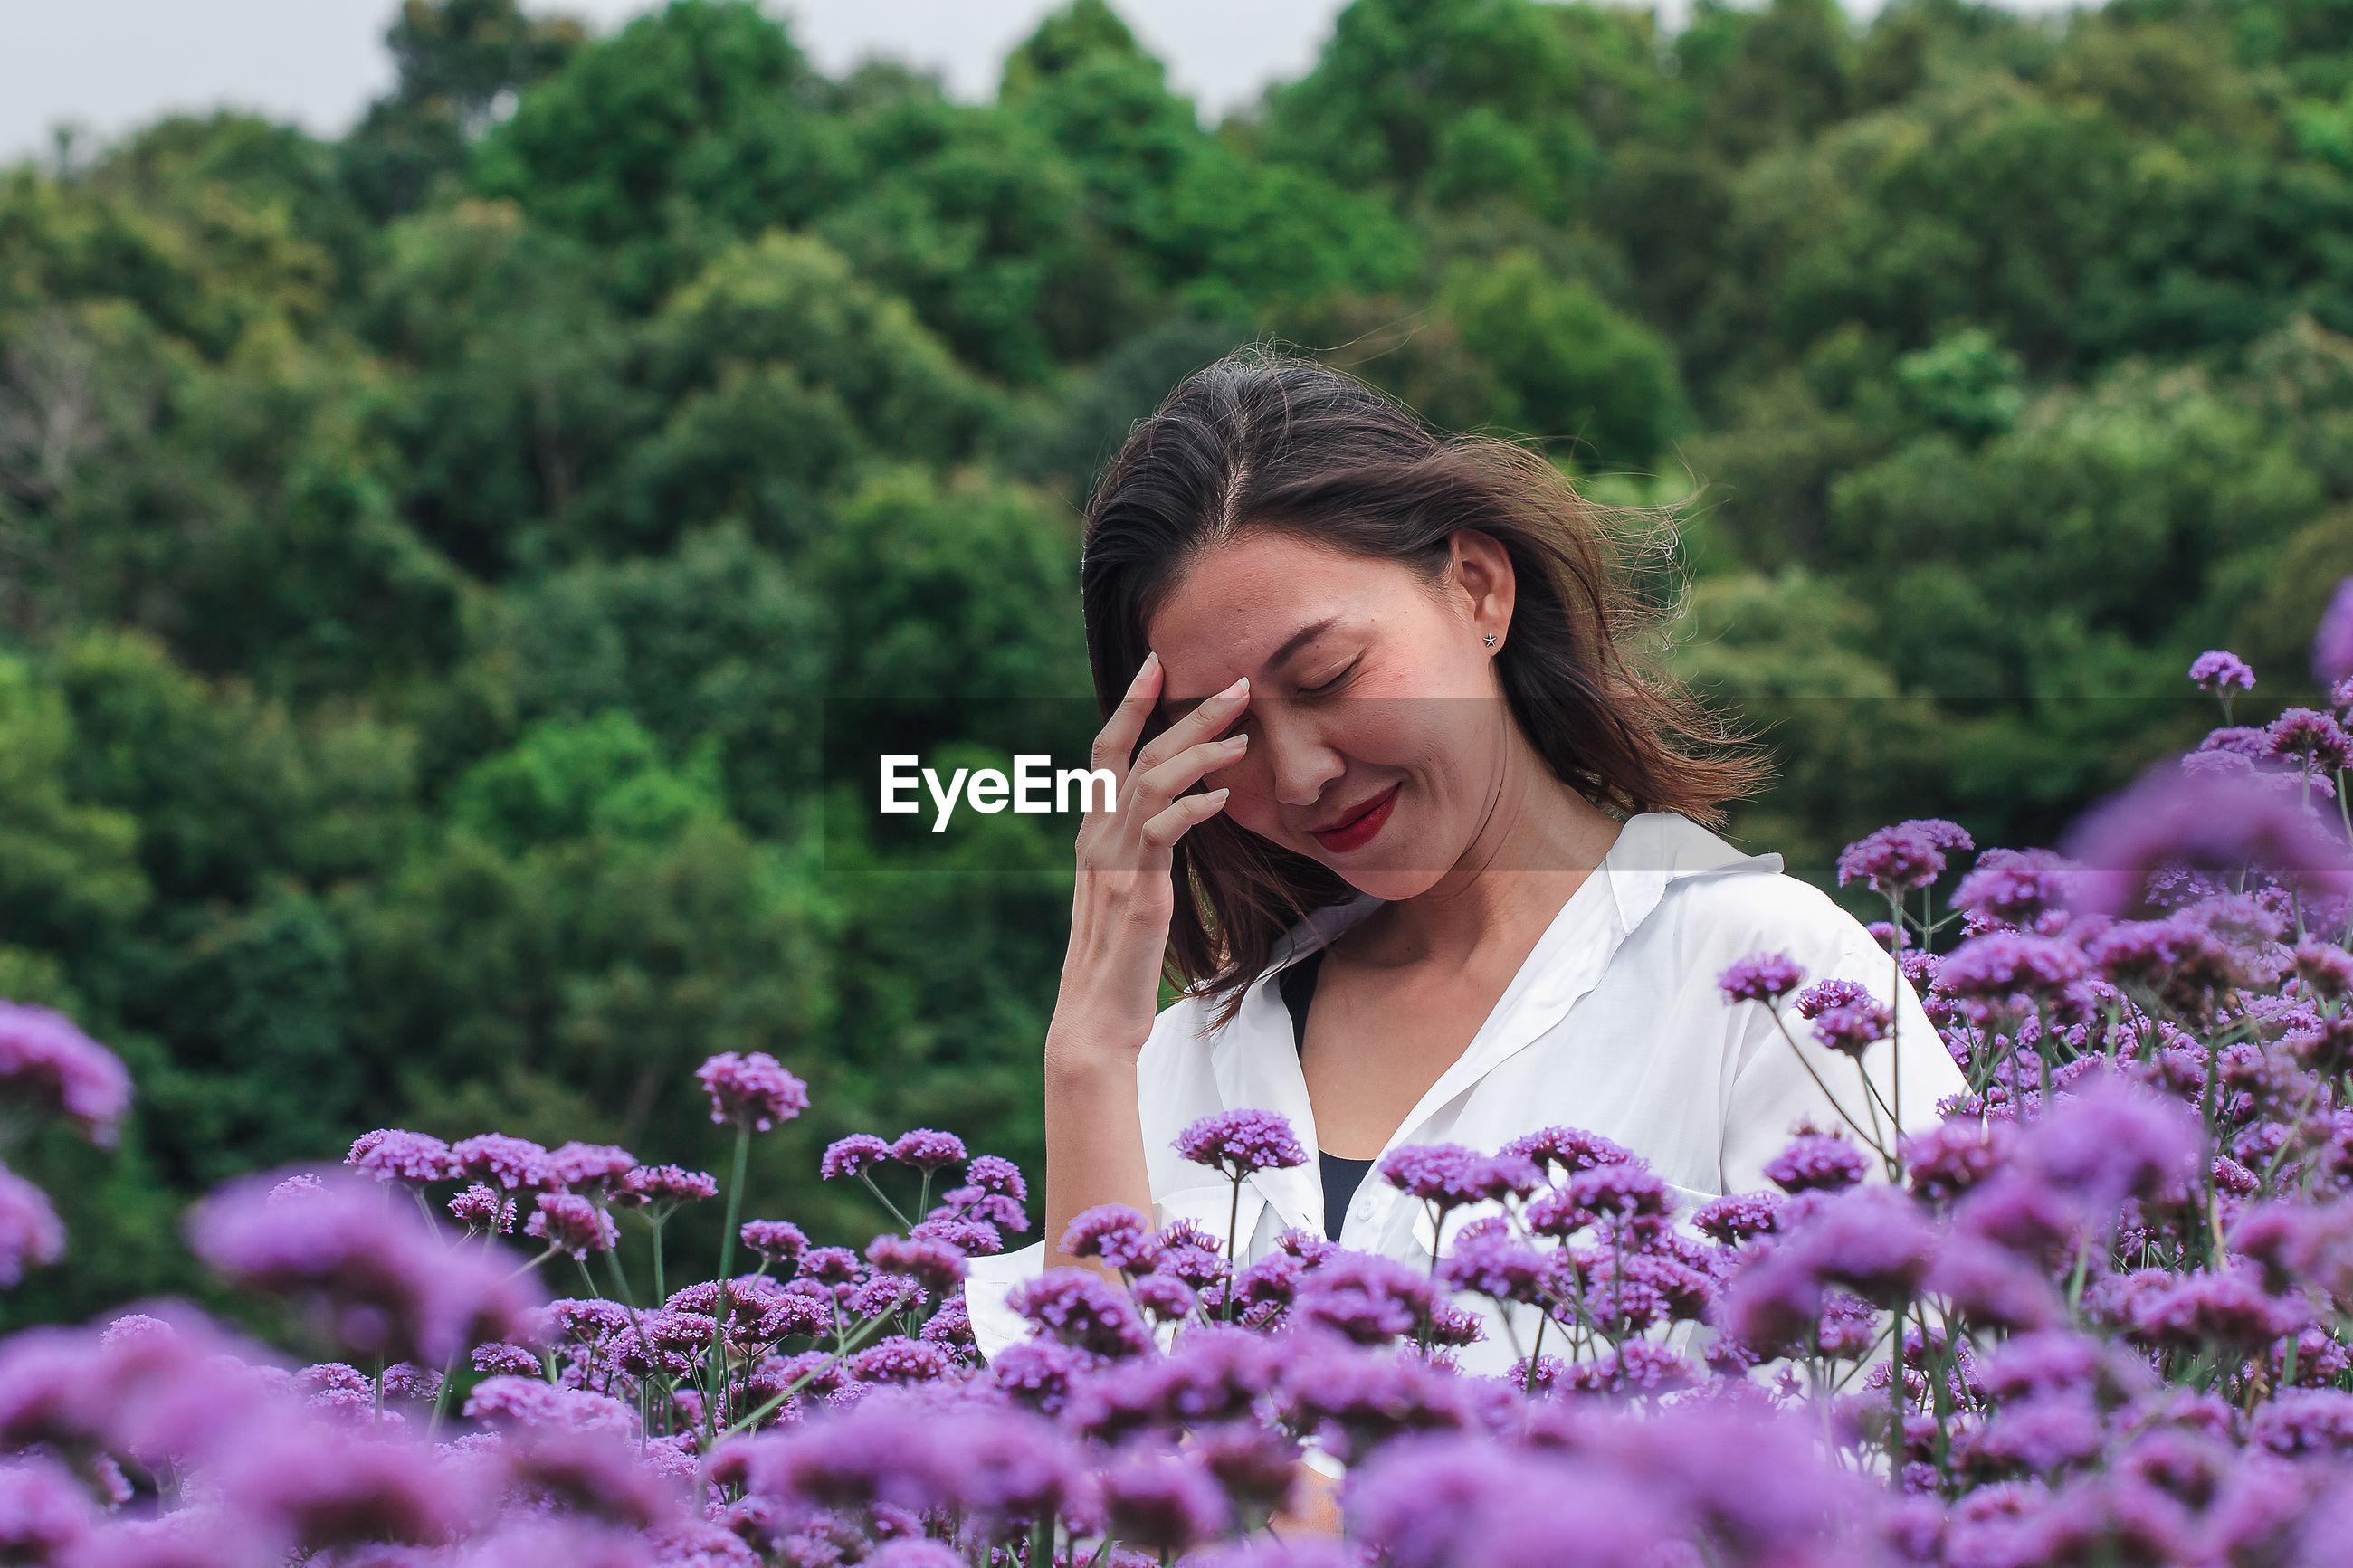 Smiling beautiful woman standing by purple flowering plants